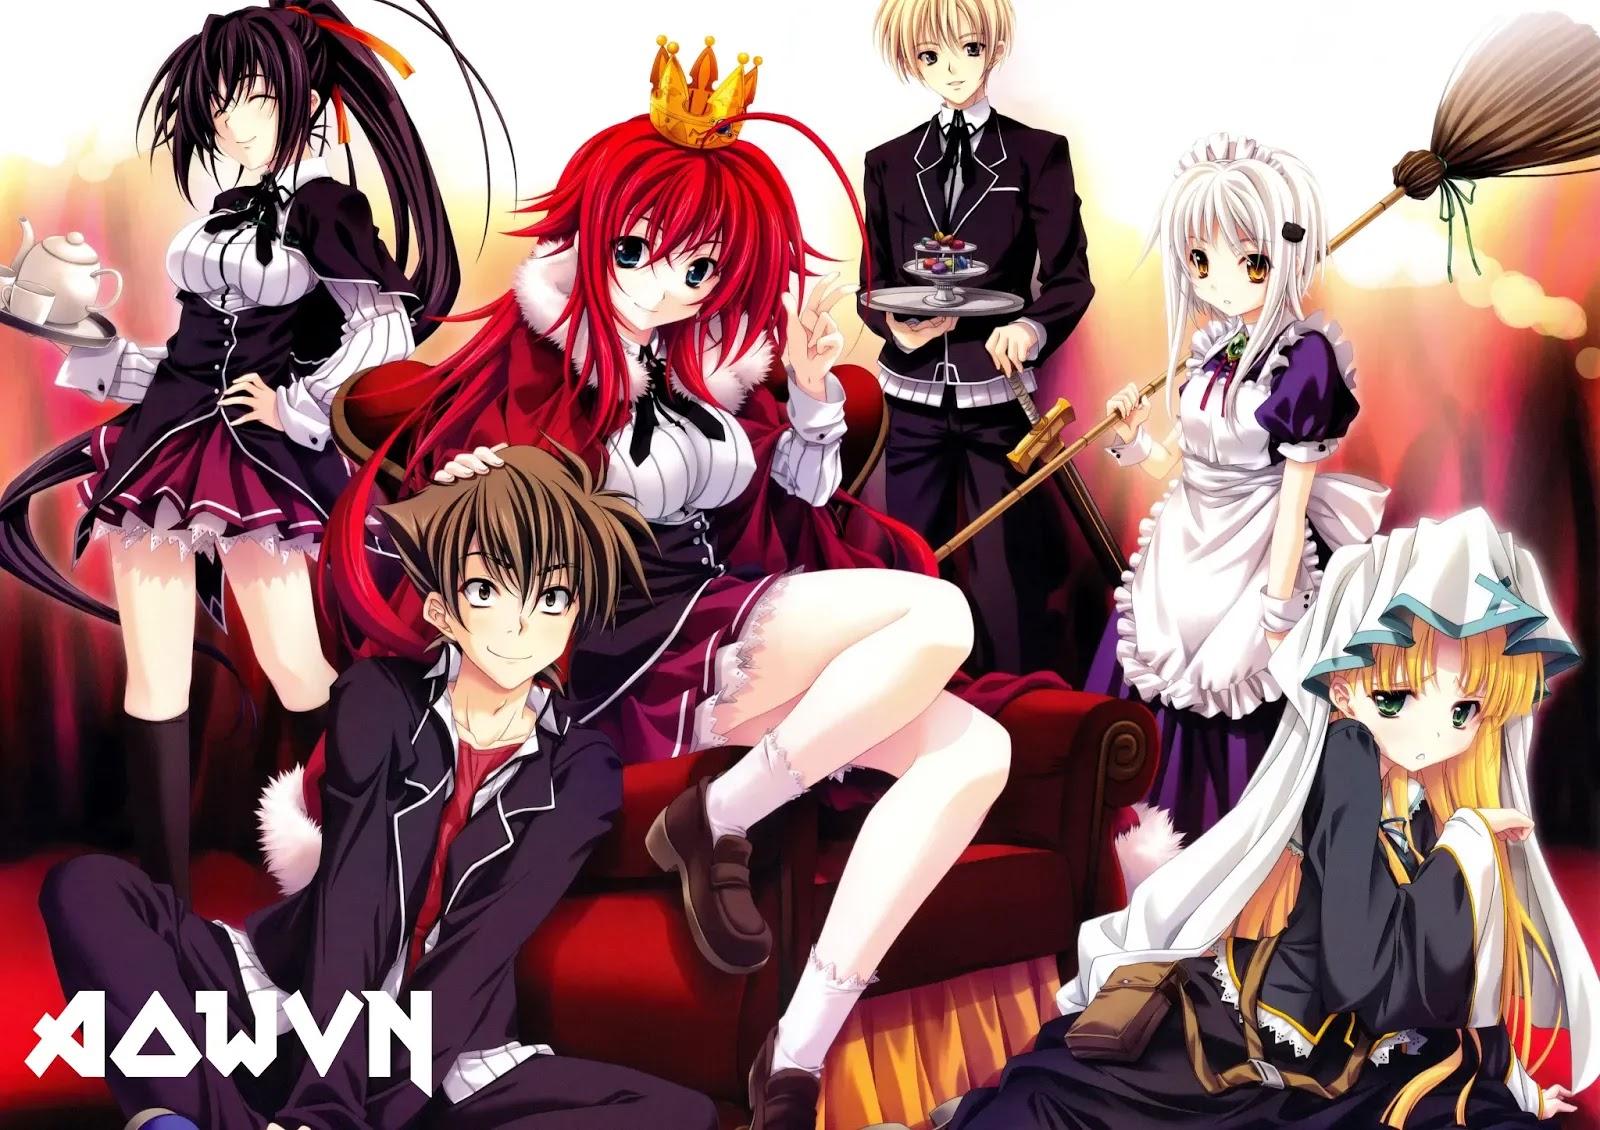 AowVN.org min%2B%25284%2529 - [ Anime 3gp Mp4 ] Highschool DxD SS1 + SS2 + SS3 + OVA + Special BD | Vietsub - Harem Ecchi Hay